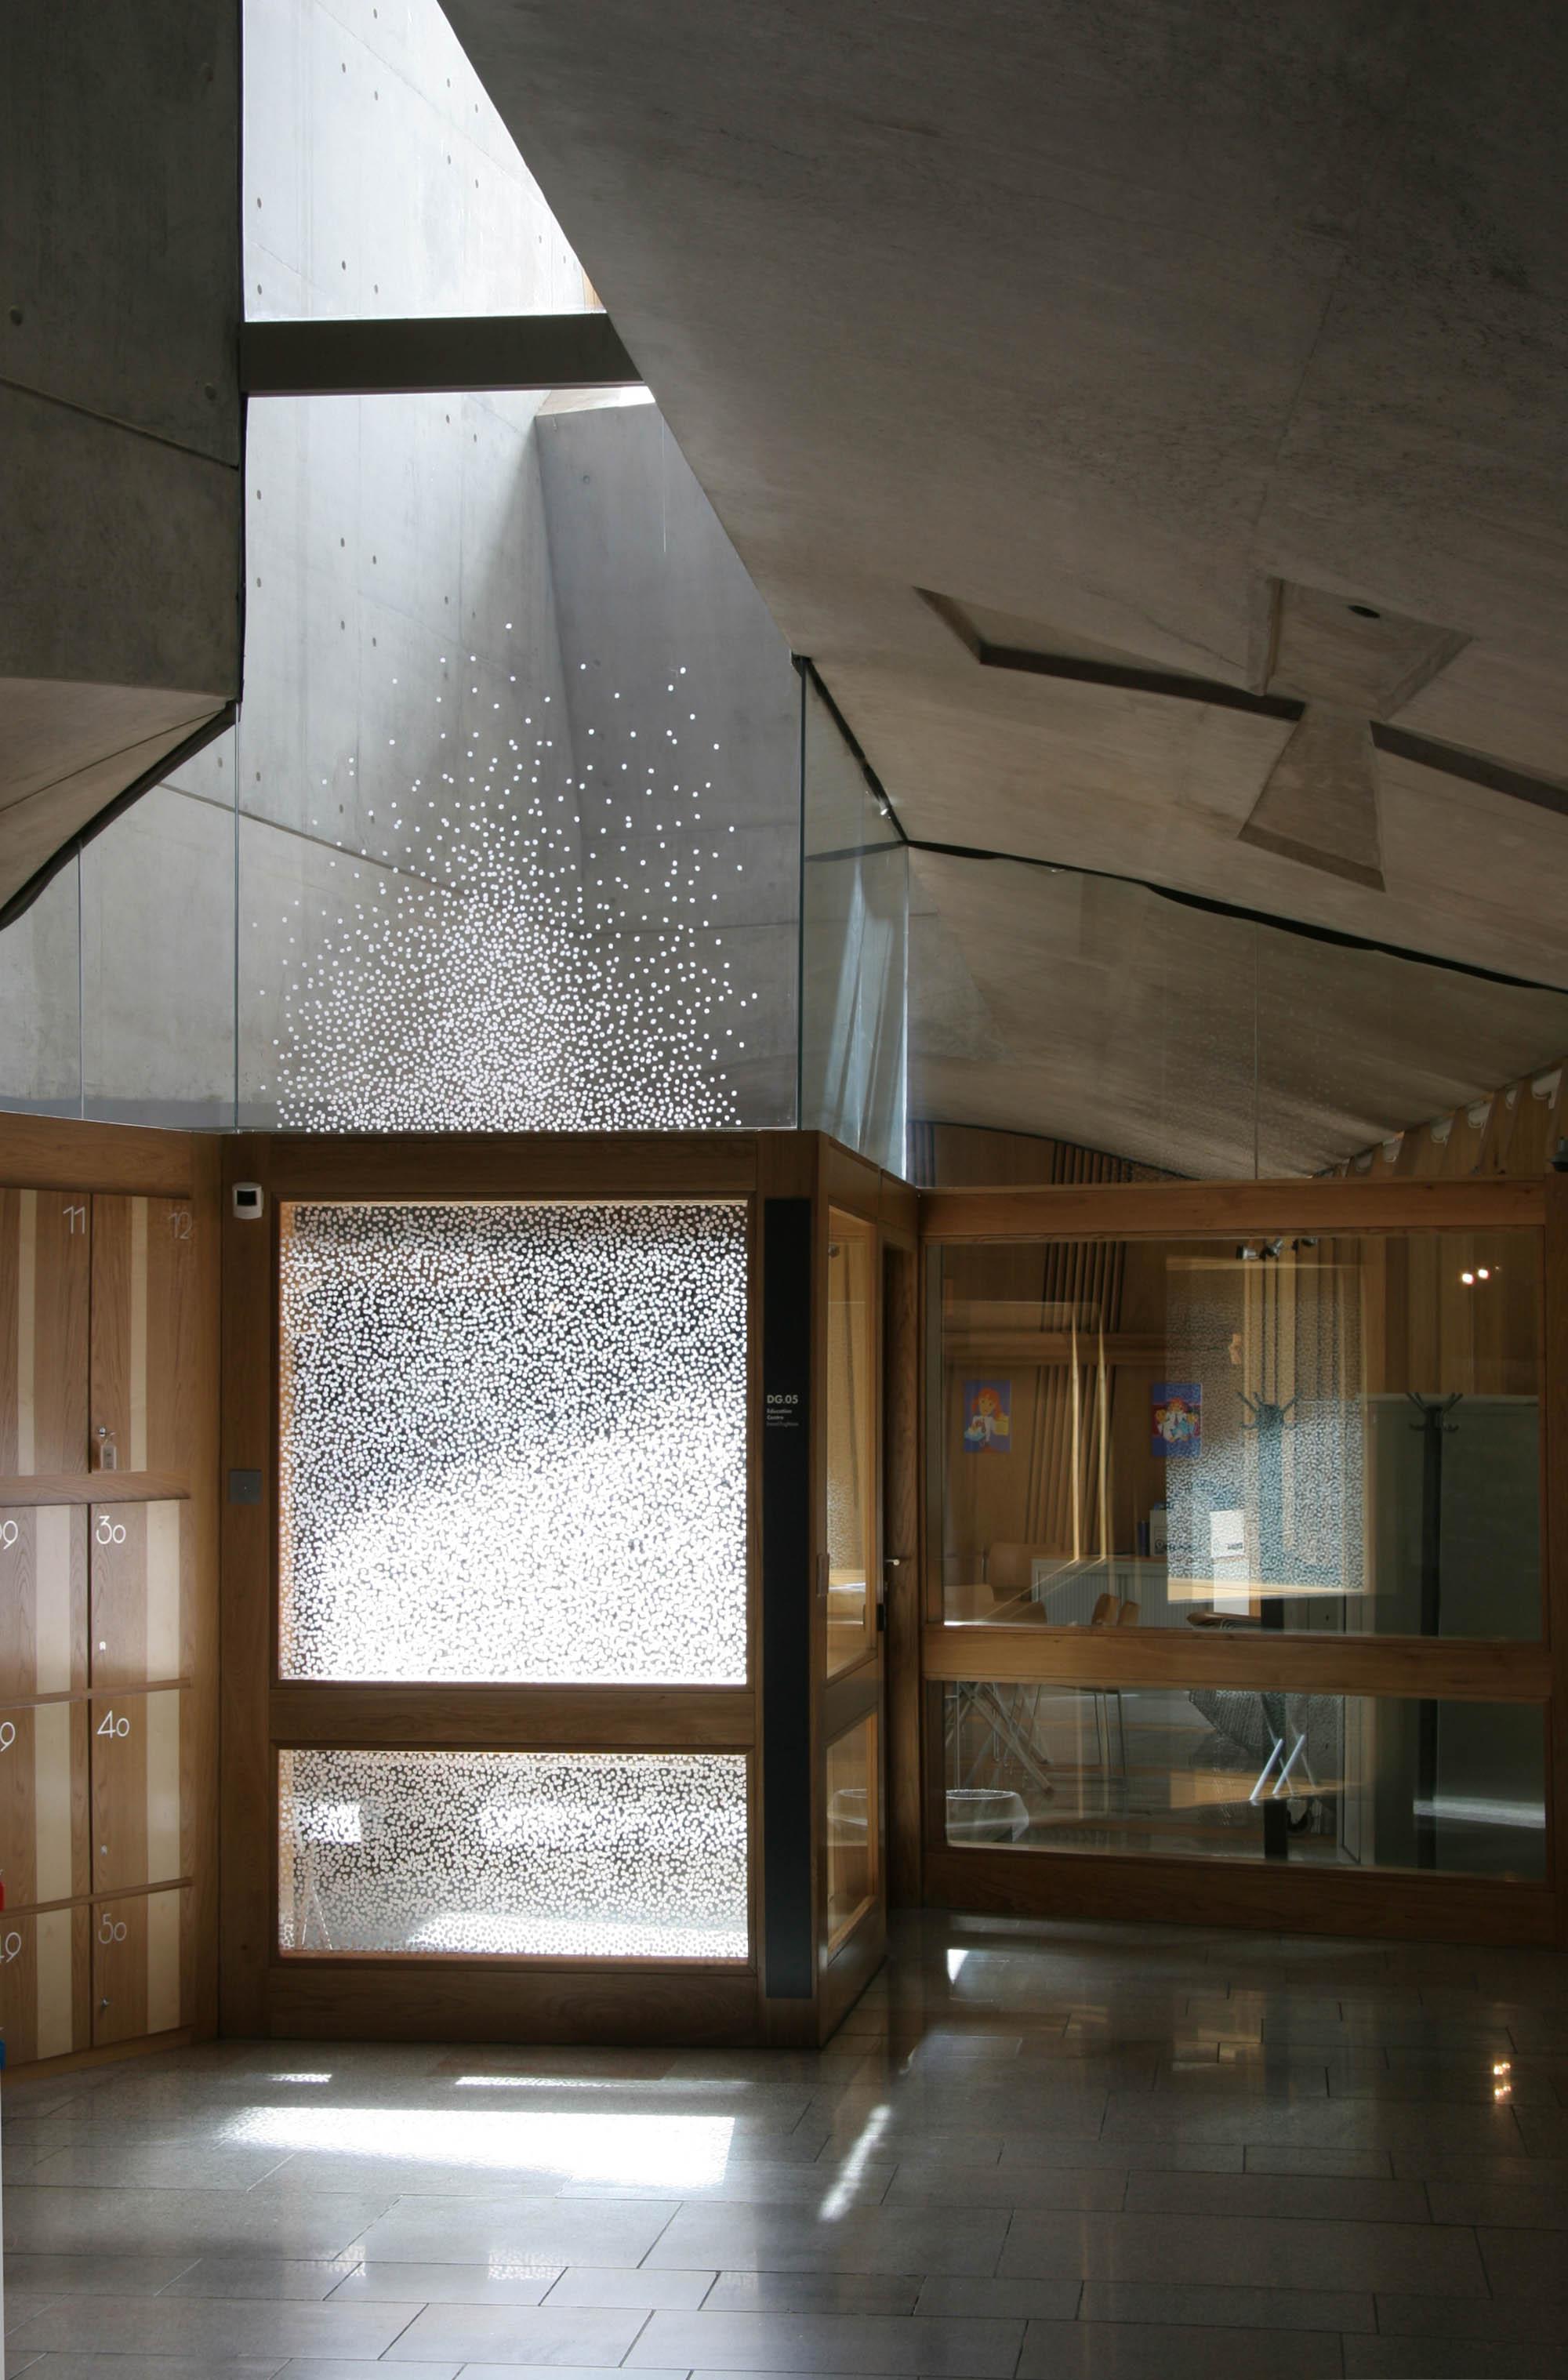 SAKURA   2007 H450, W150 cm Pigmented paper on glass Temporary installation at Scottish Parliament, Edinburgh UK